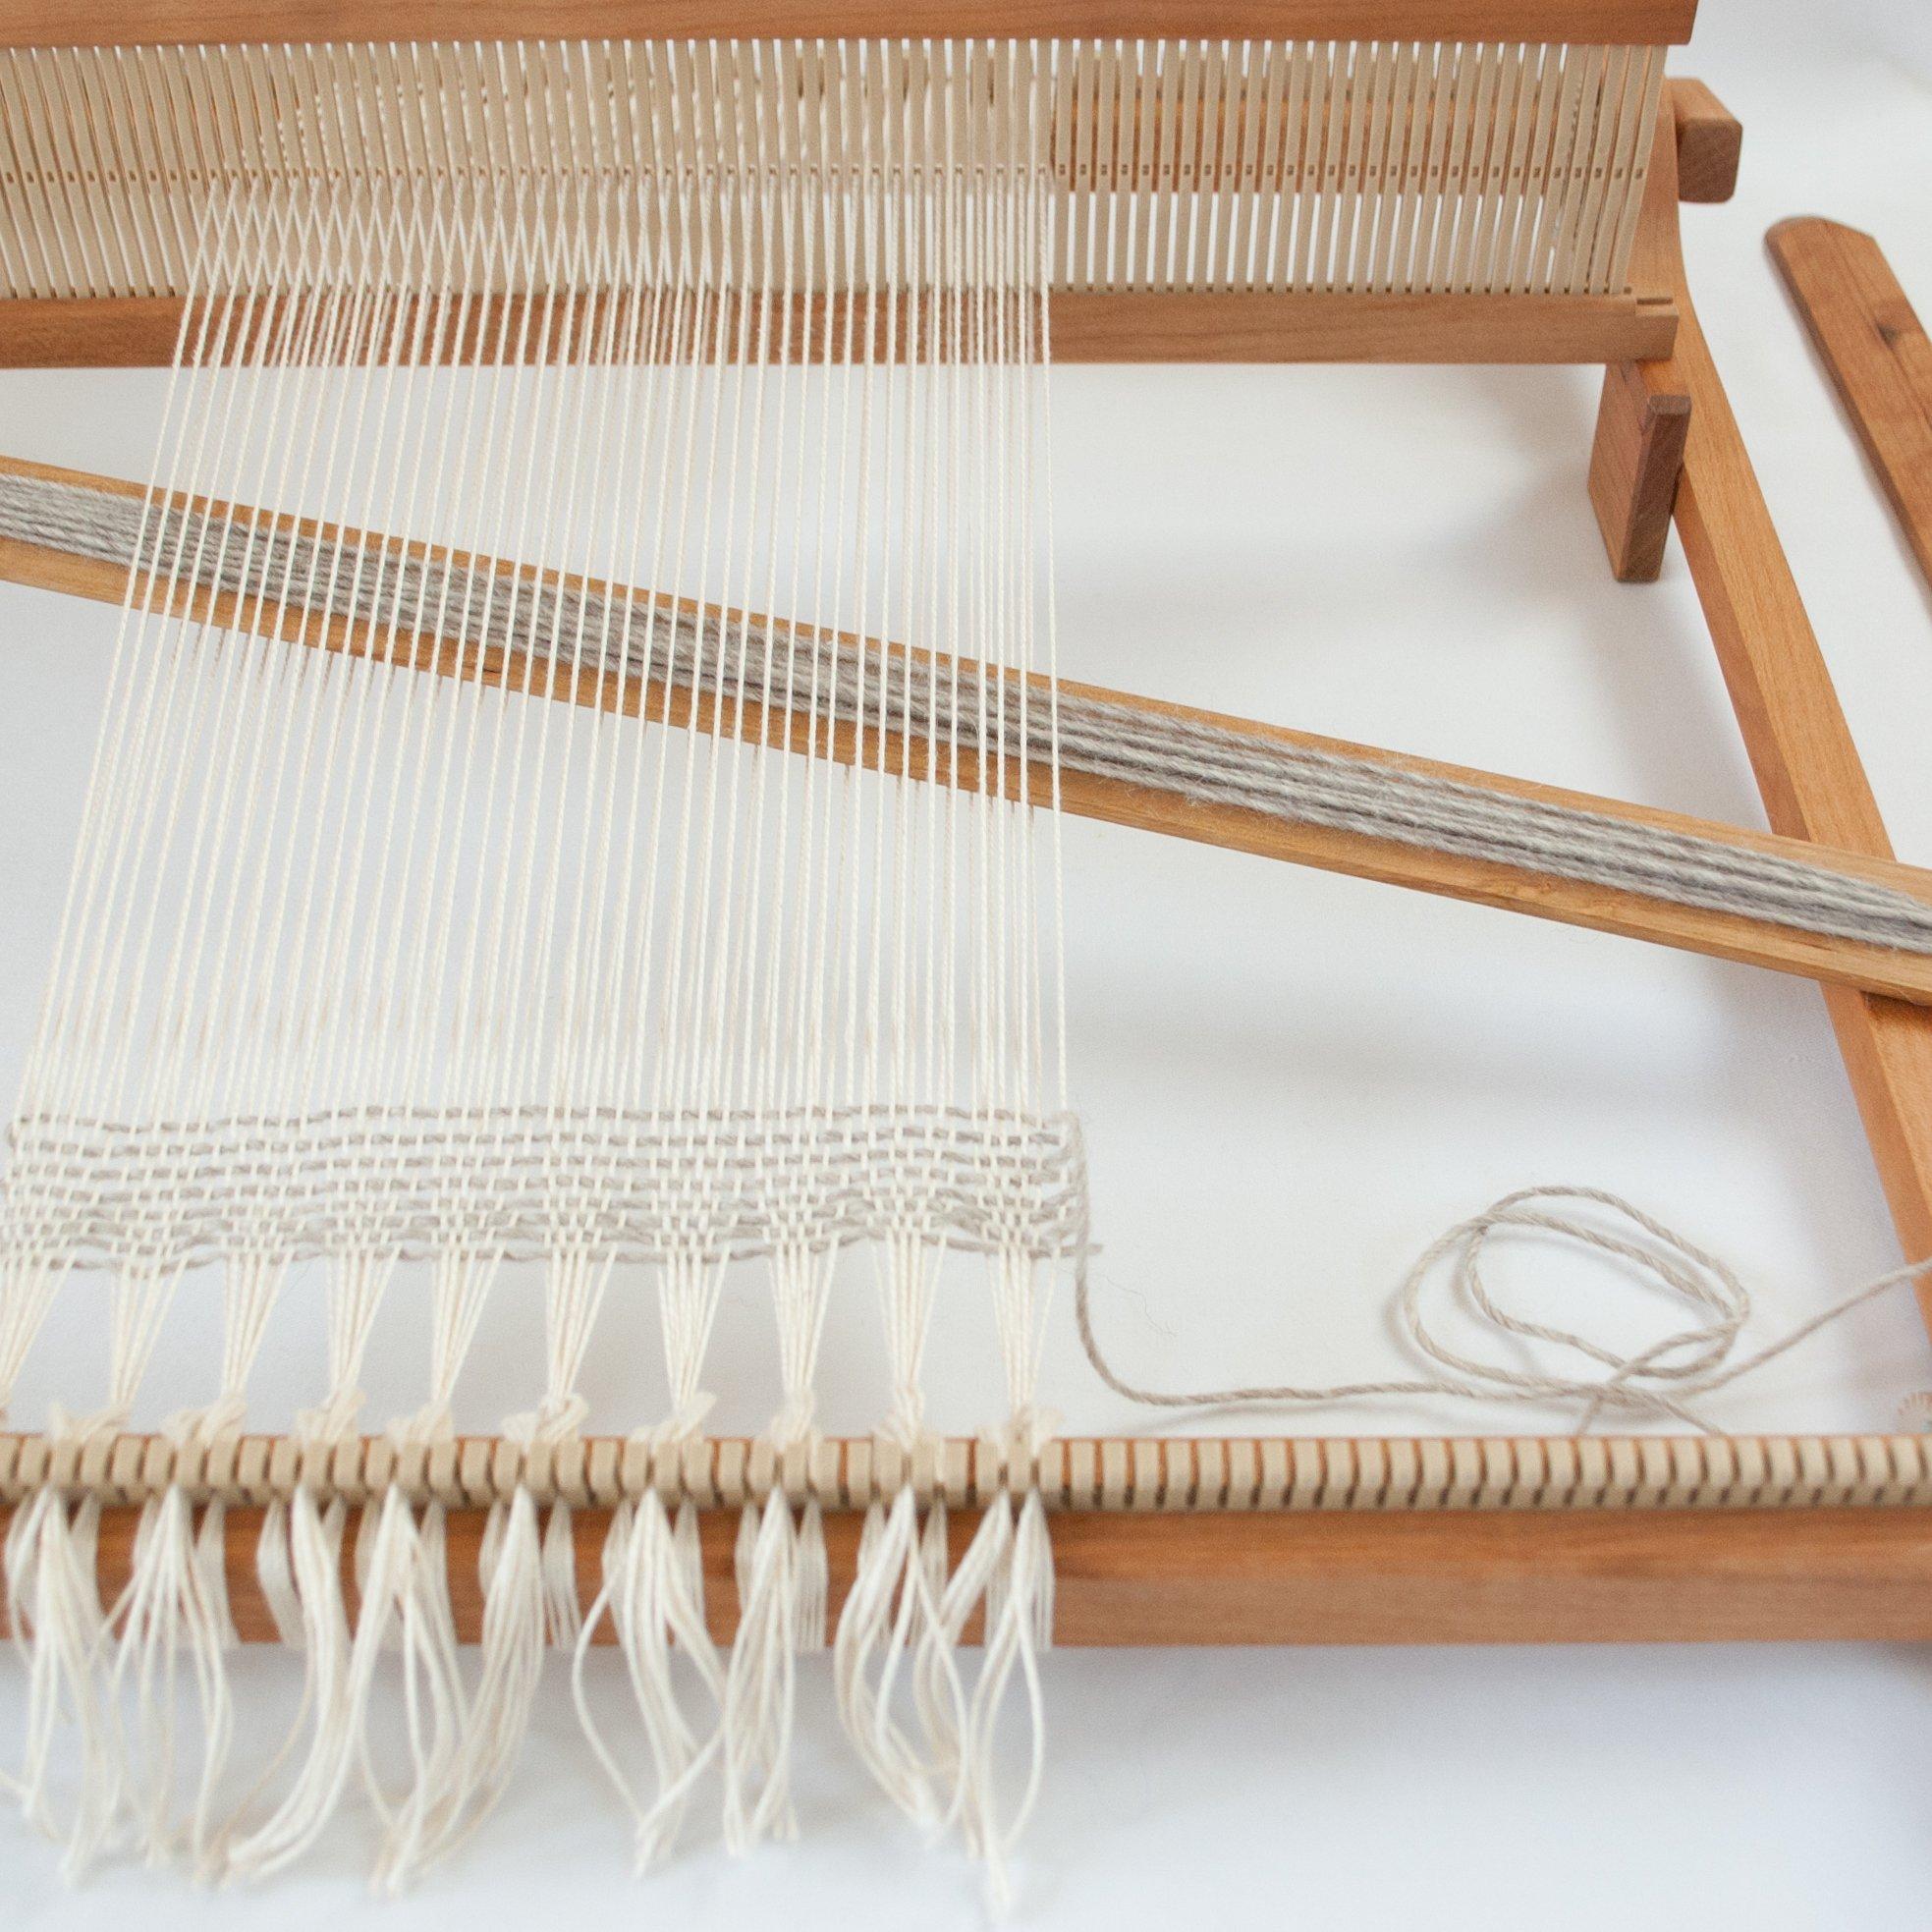 Beka Original Rigid Heddle Loom, SG-24'' by Beka